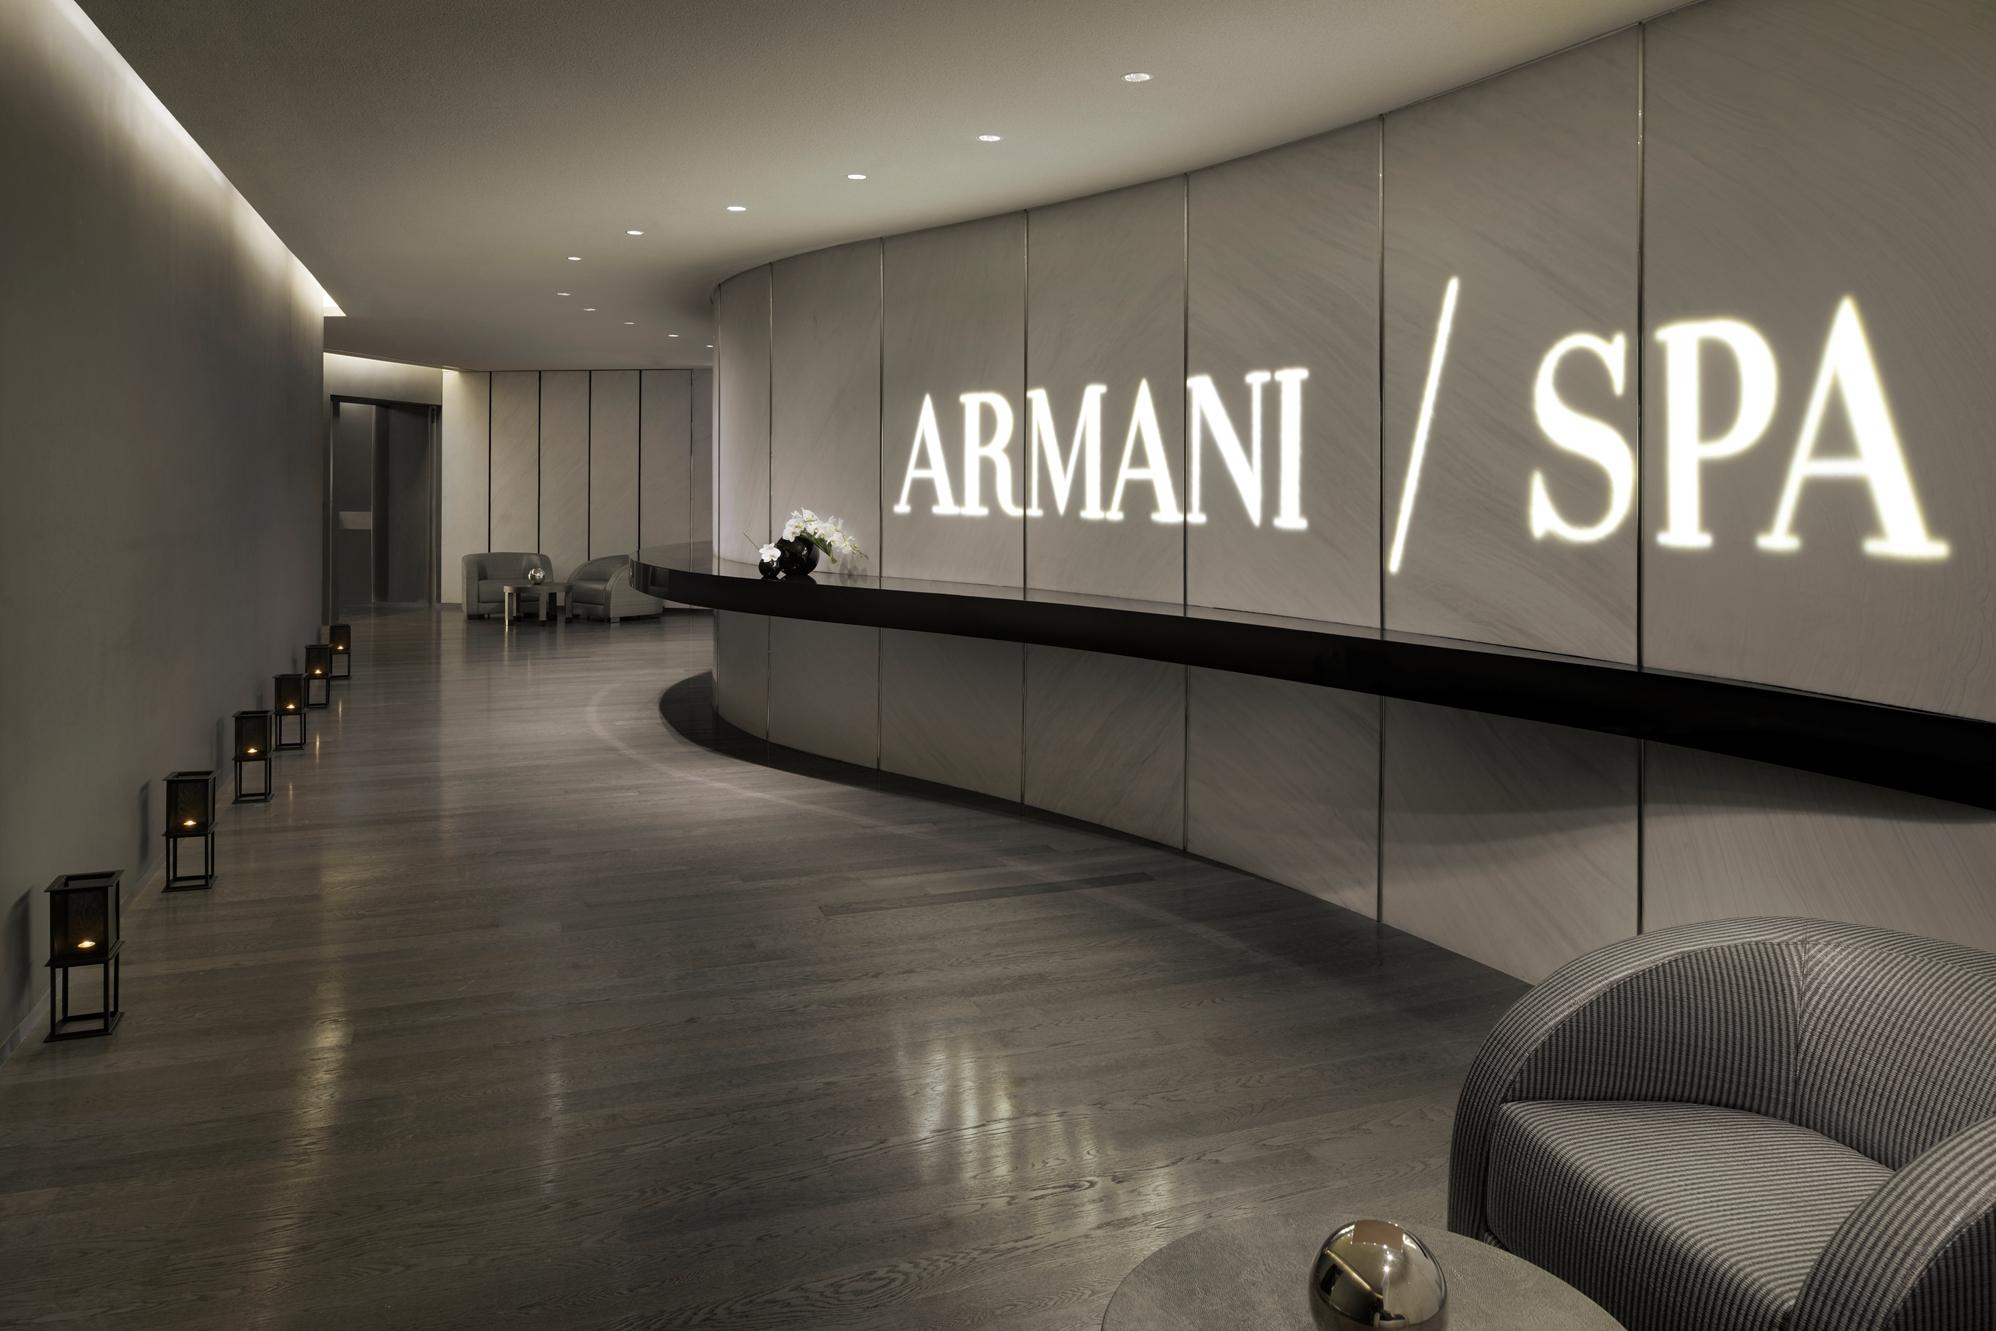 Armani Spa Entrance2